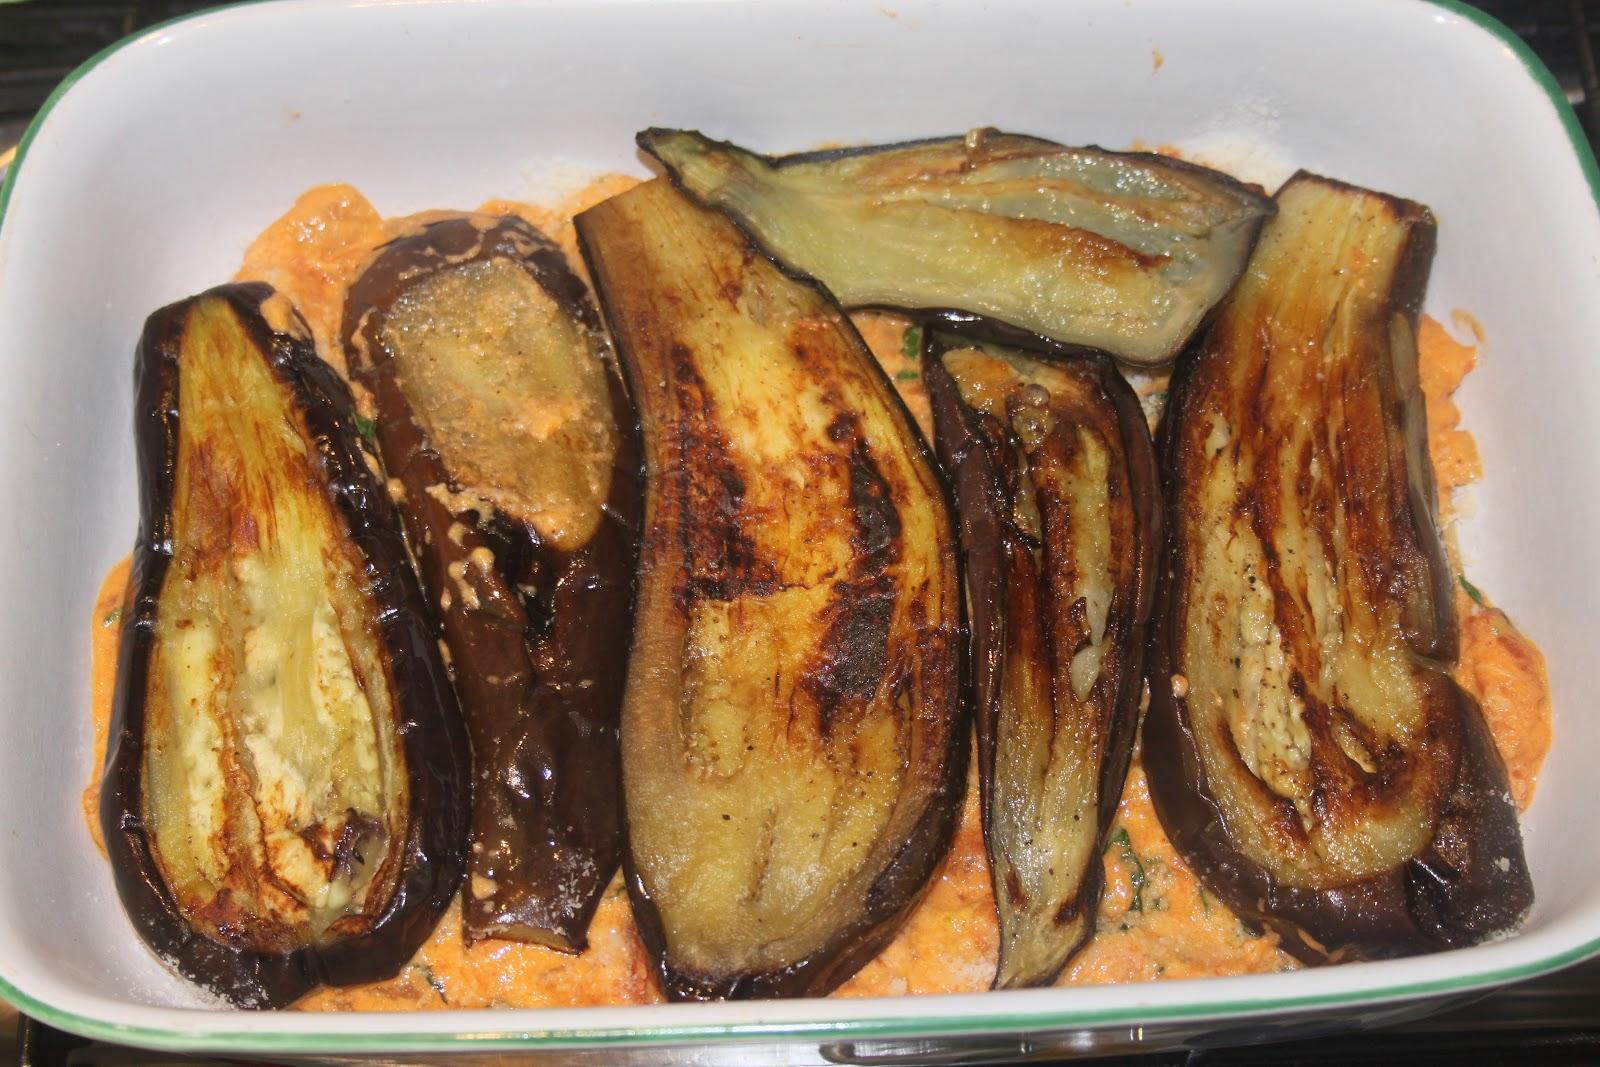 La cuisine de bernard lasagnes aux aubergines - Aubergine grillee a l italienne ...